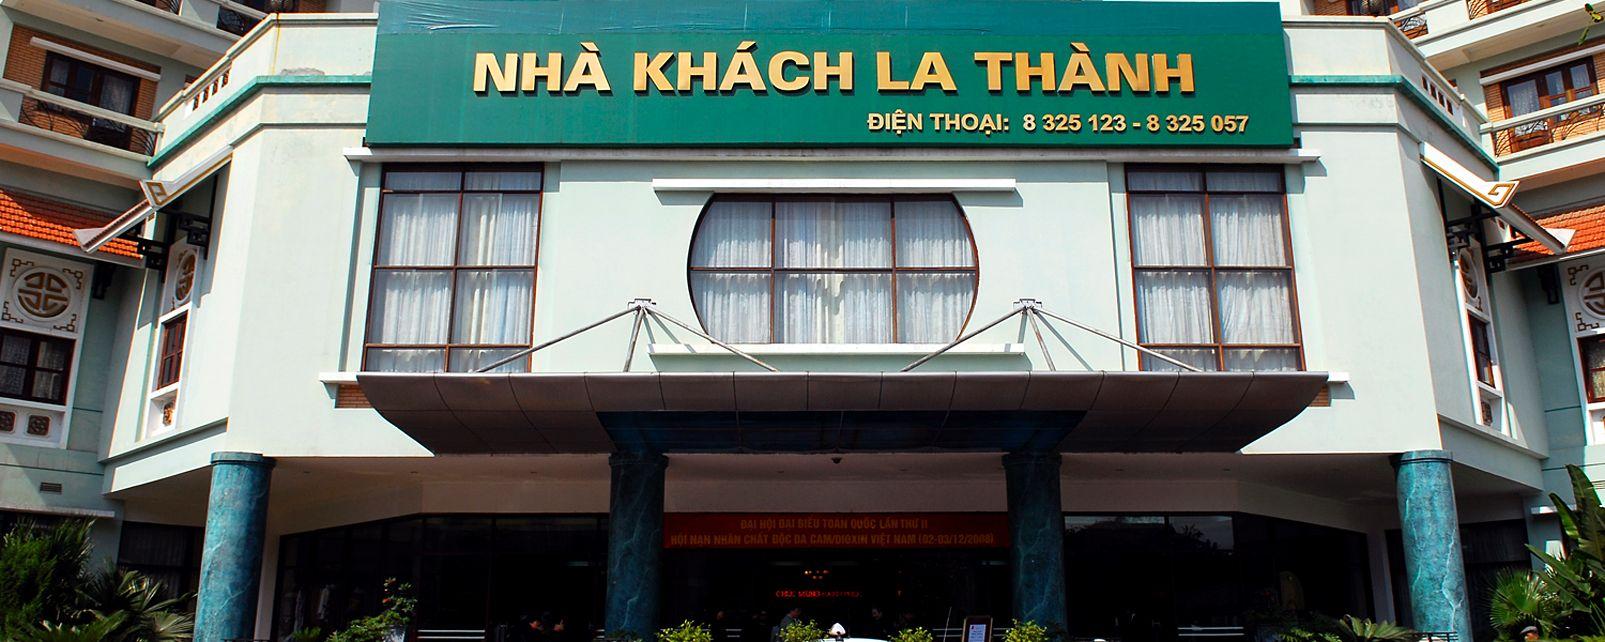 Hôtel La Than Hotel